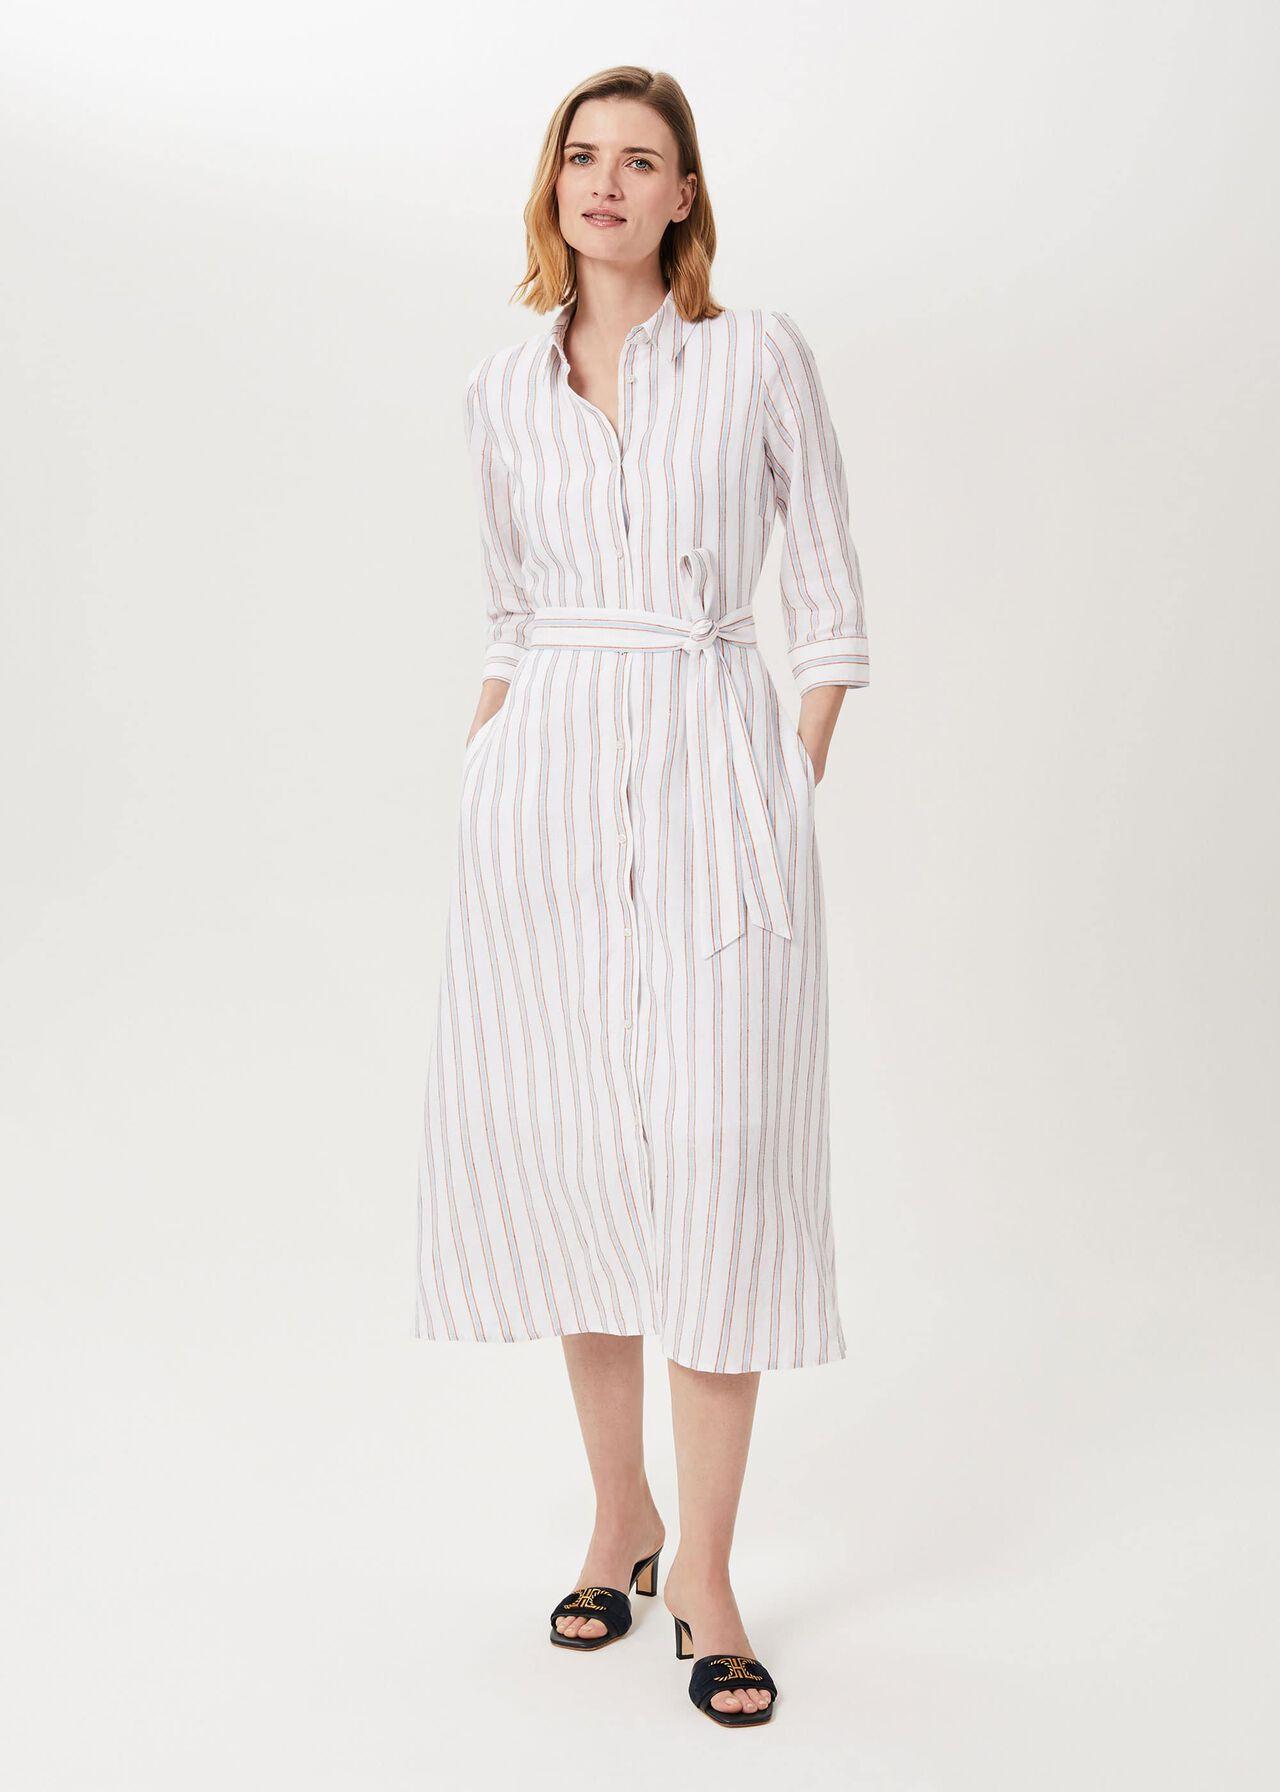 Ciara Linen Dress, Ivory Multi, hi-res